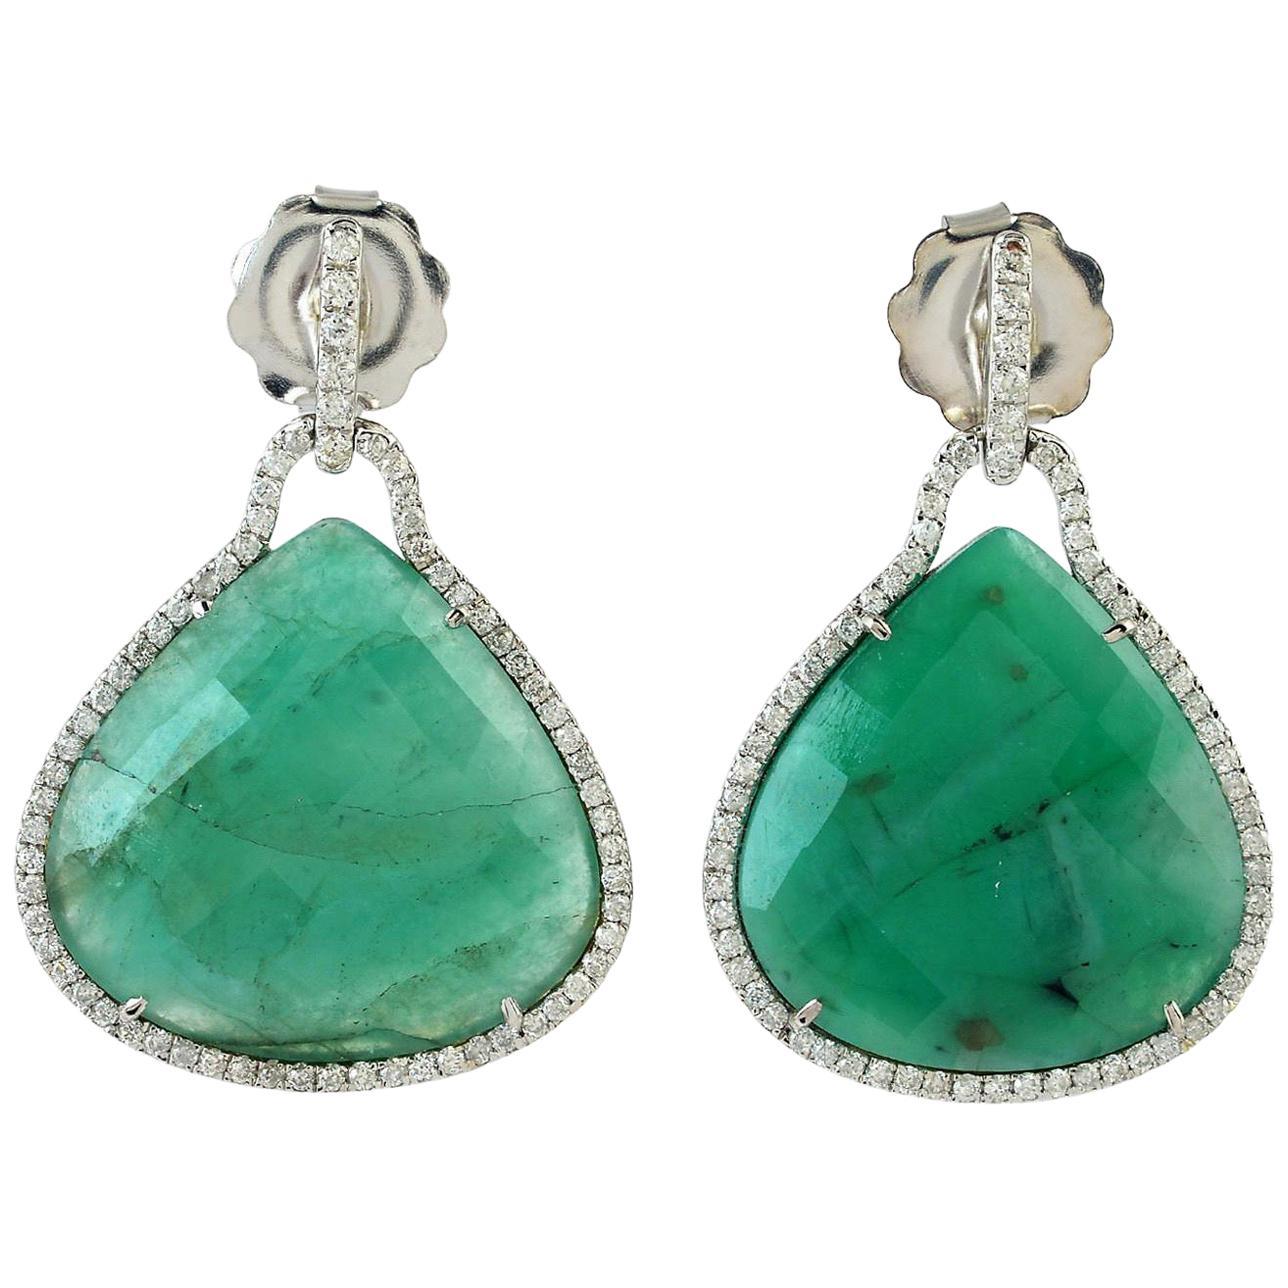 22.8 Carat Emerald Diamond 18 Karat White Gold Earrings